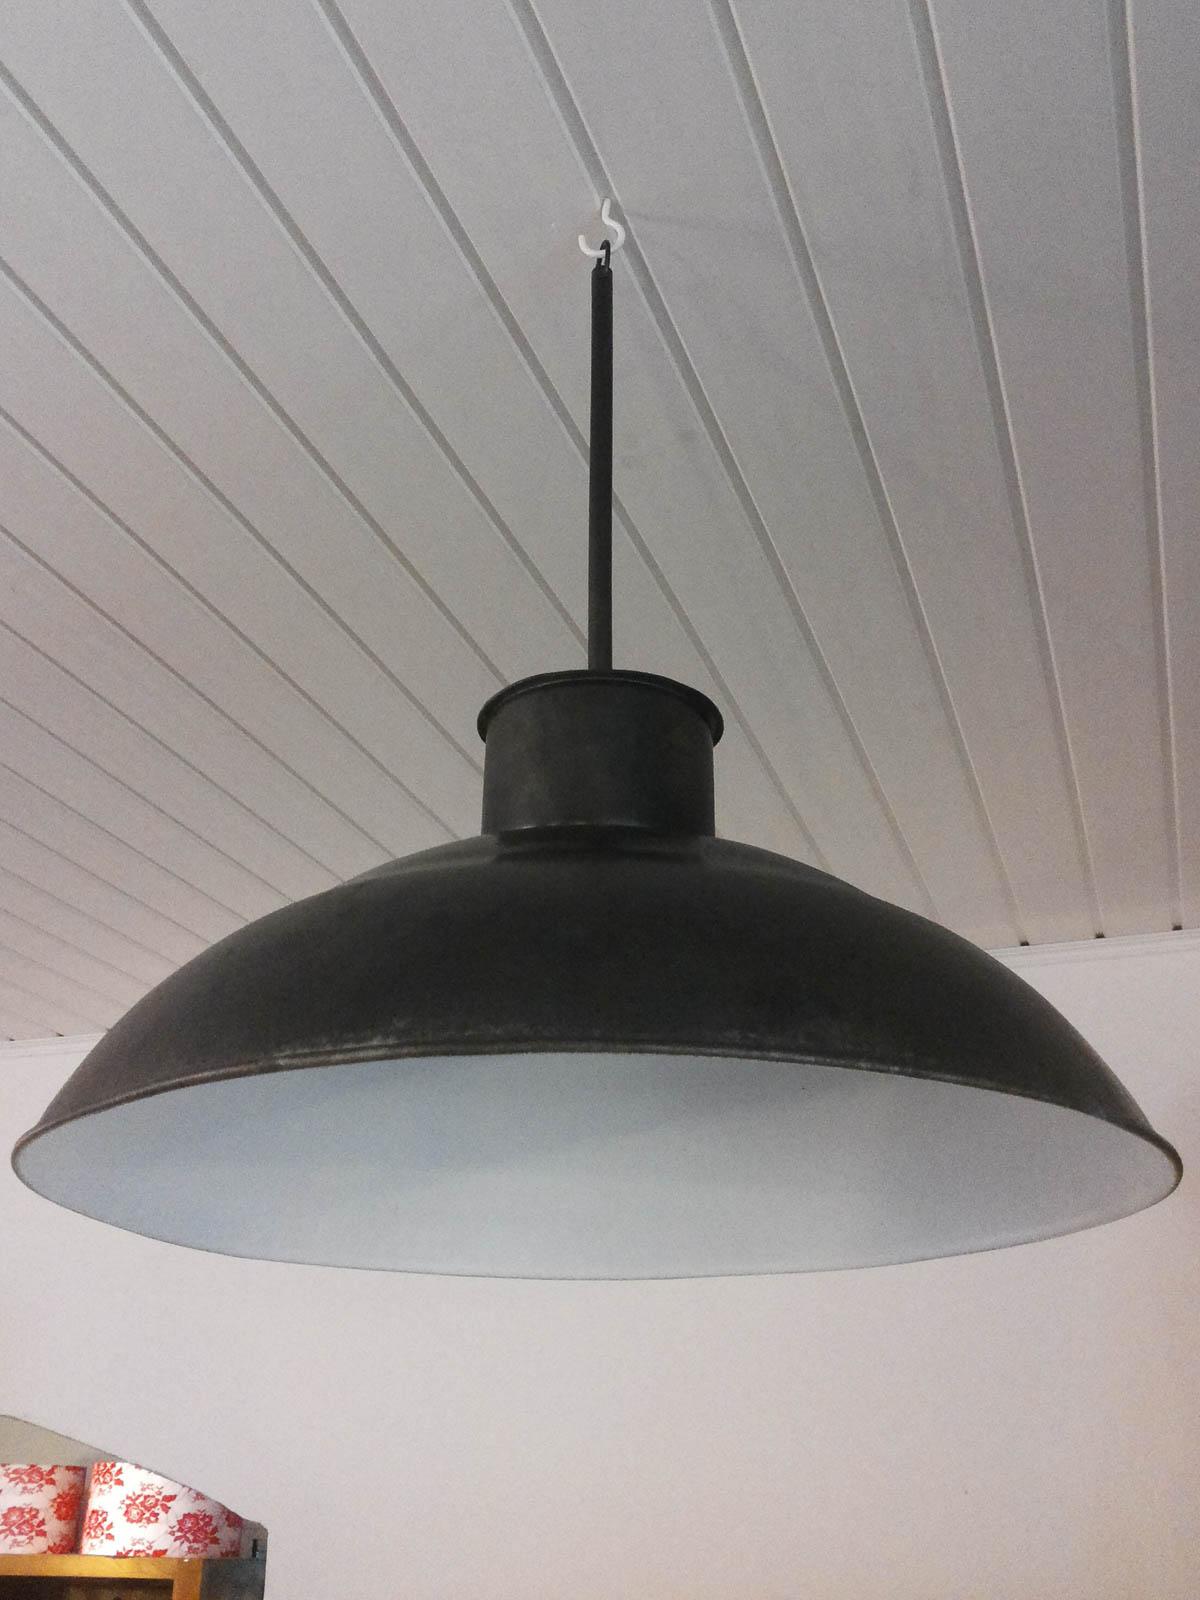 plafonnier suspendu industriel la case d co. Black Bedroom Furniture Sets. Home Design Ideas